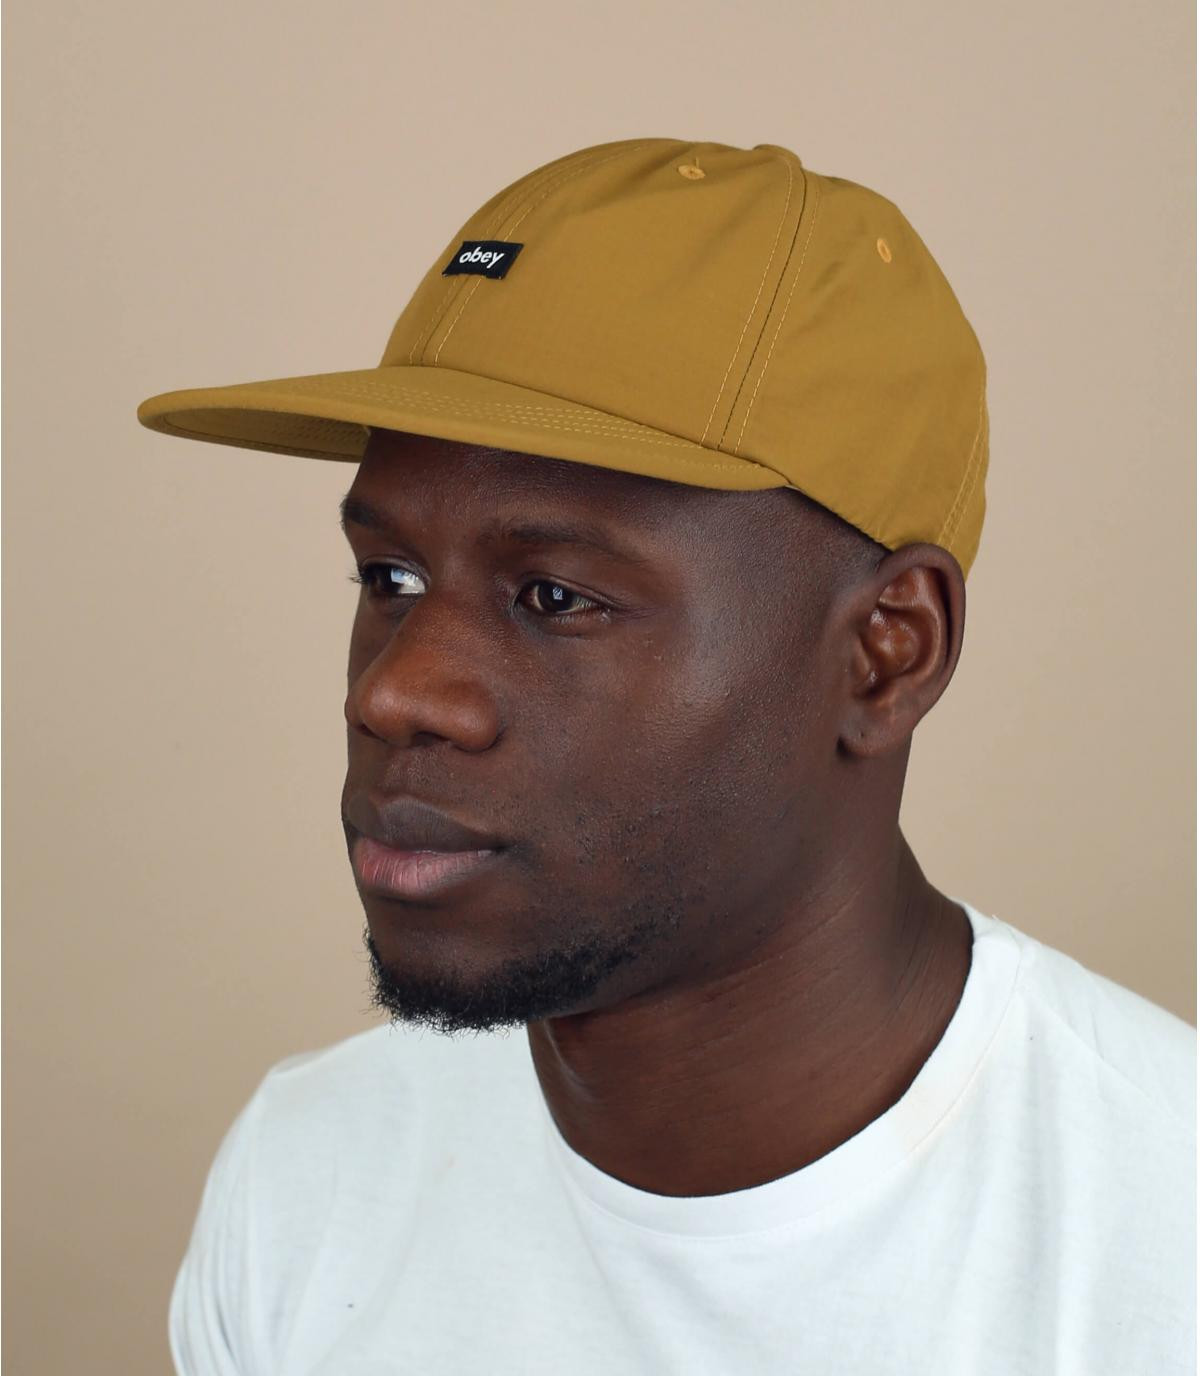 beige Obey cap